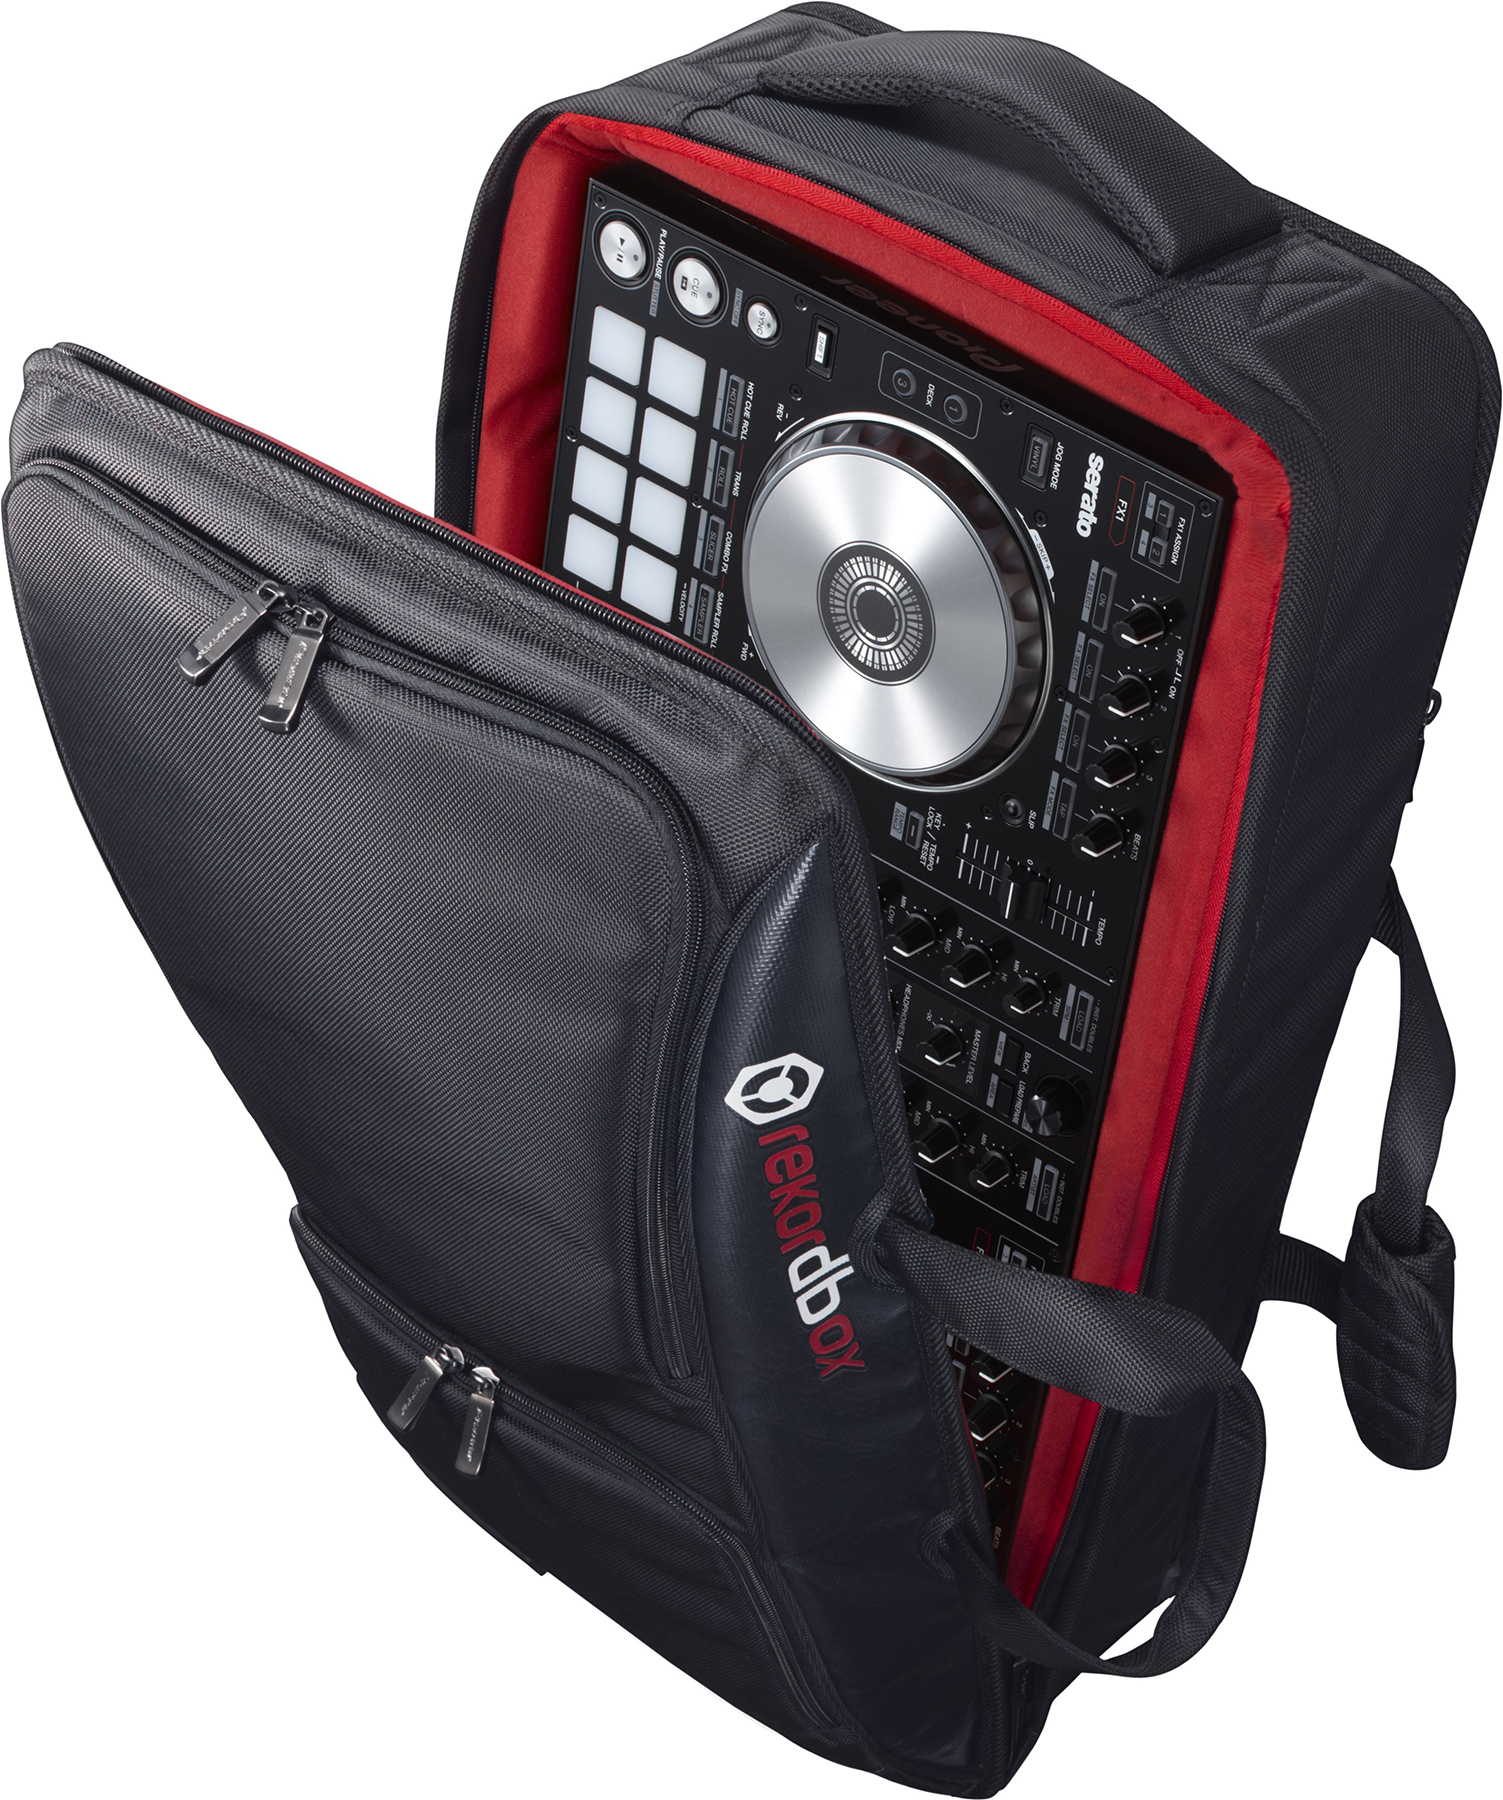 Pioneer Dj Djc Sc2 Controller Bag For